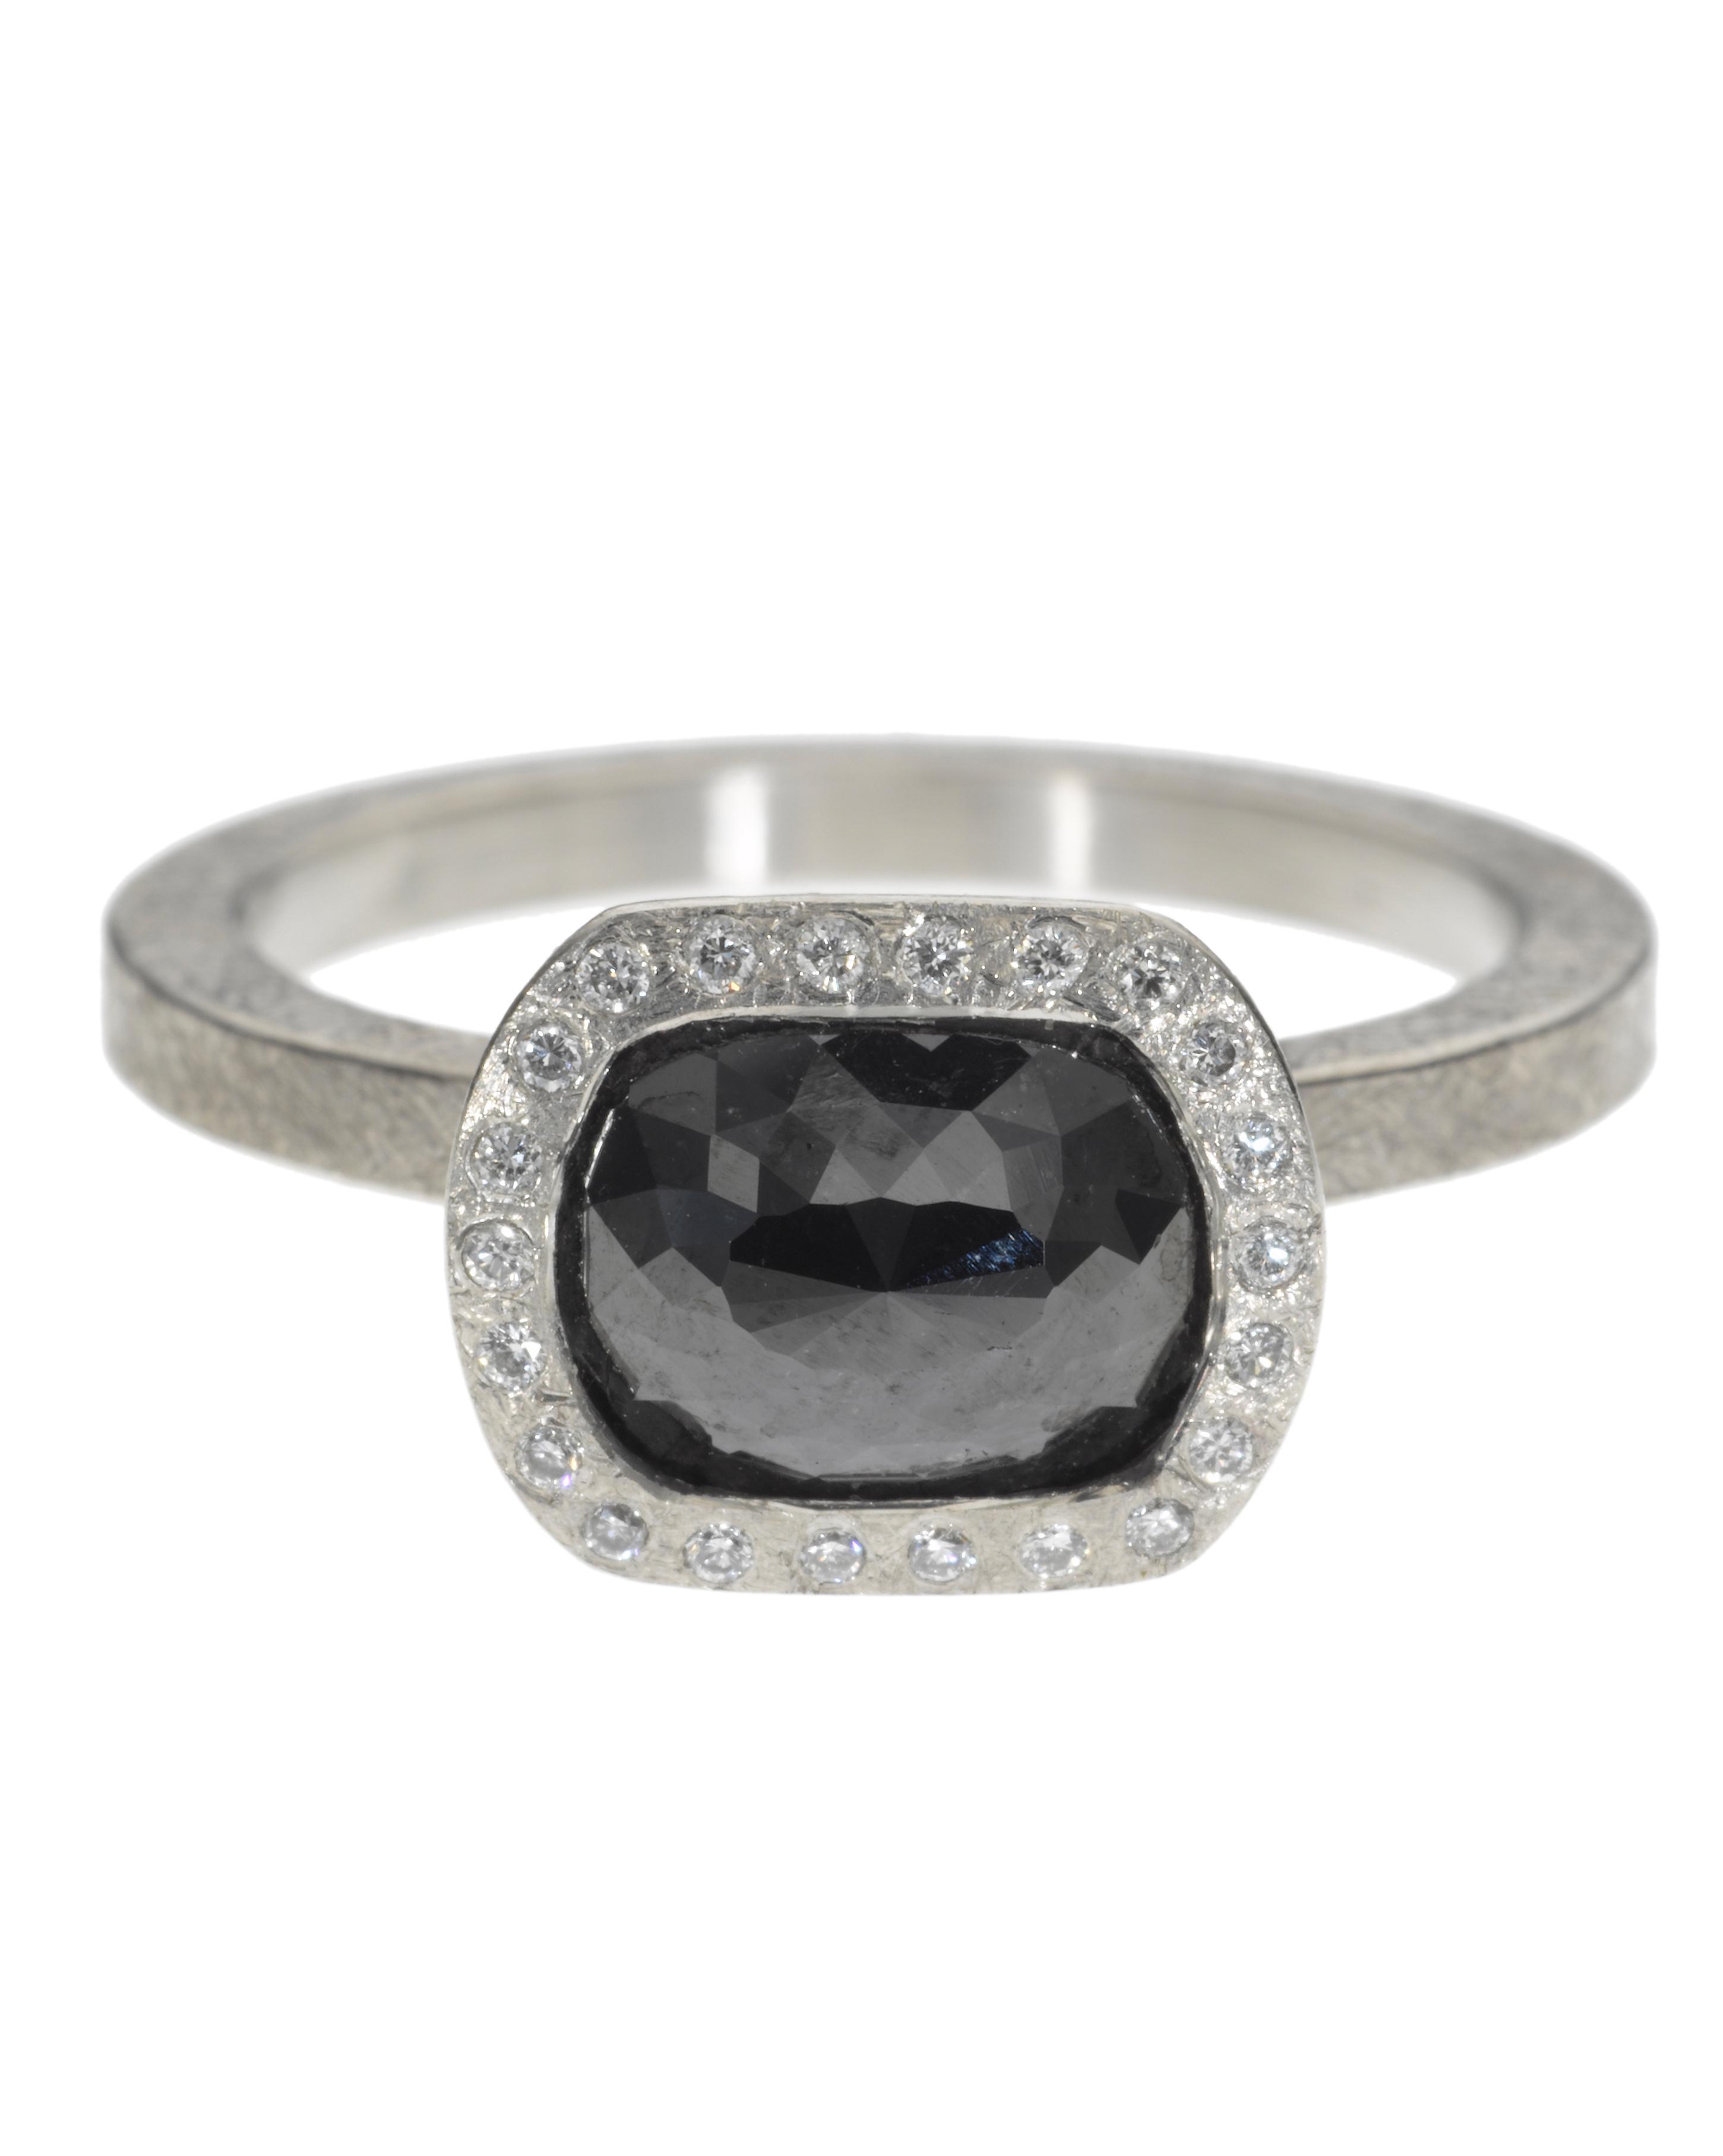 black-diamond-engagement-rings-todd-reed-3-0814.jpg